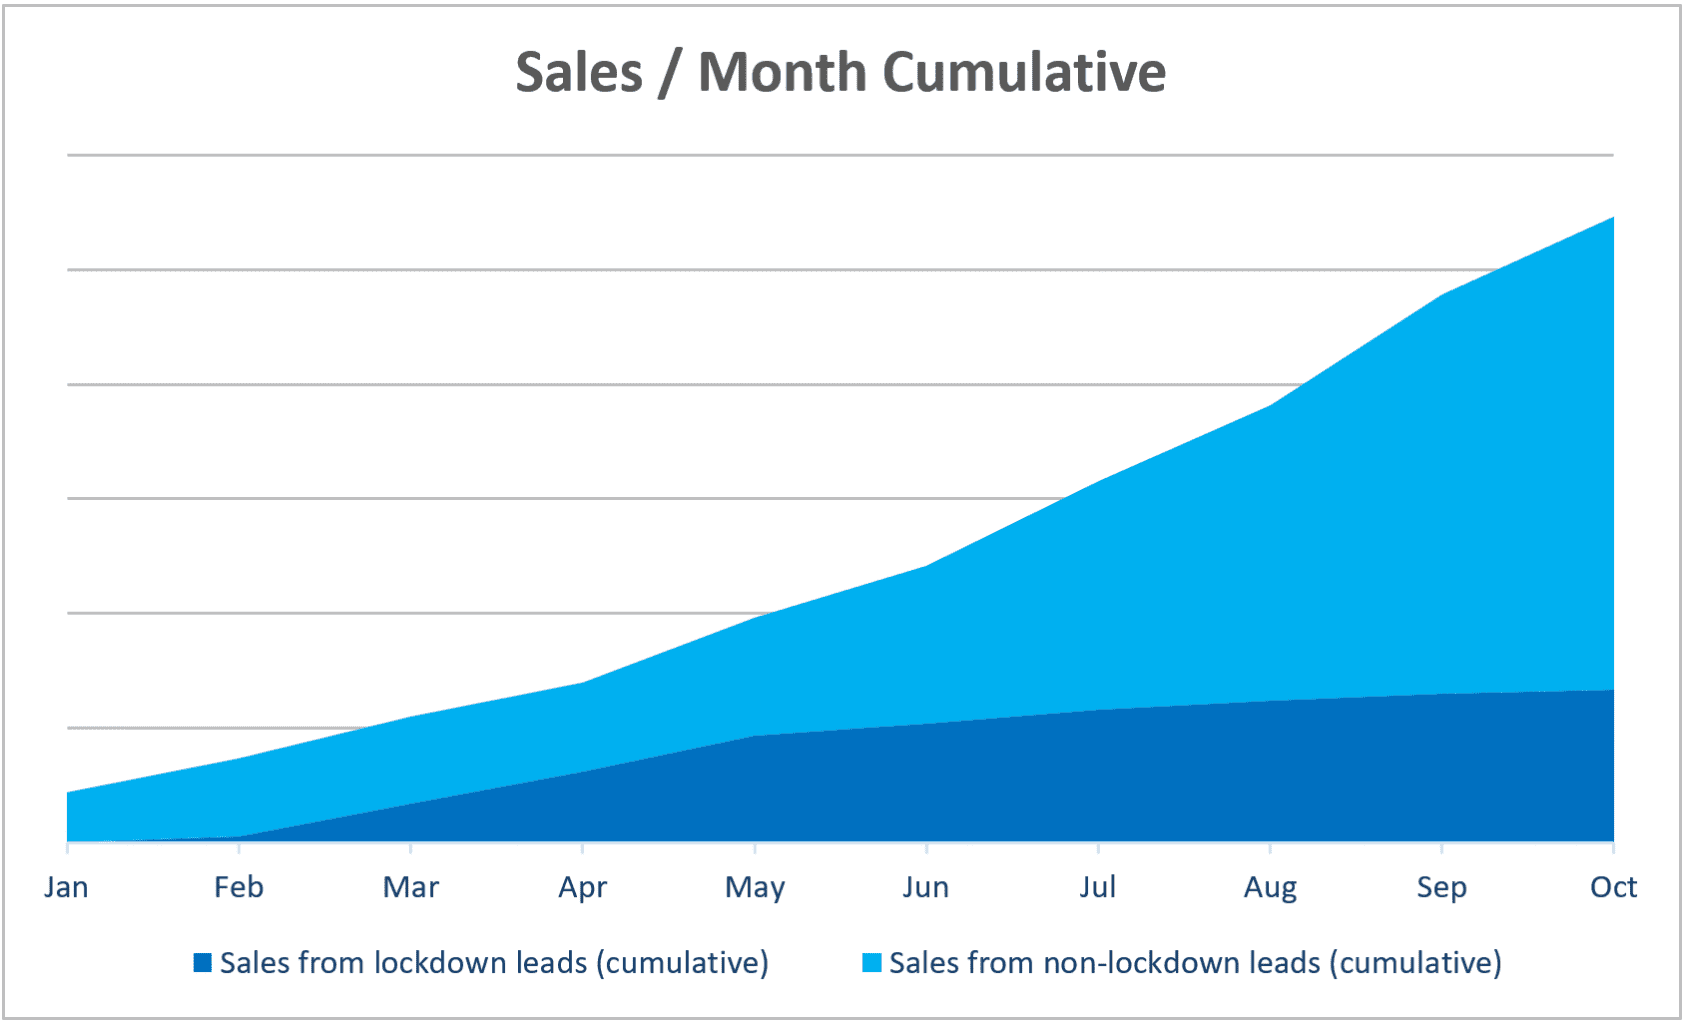 graph showing lockdown sales per month cumulative